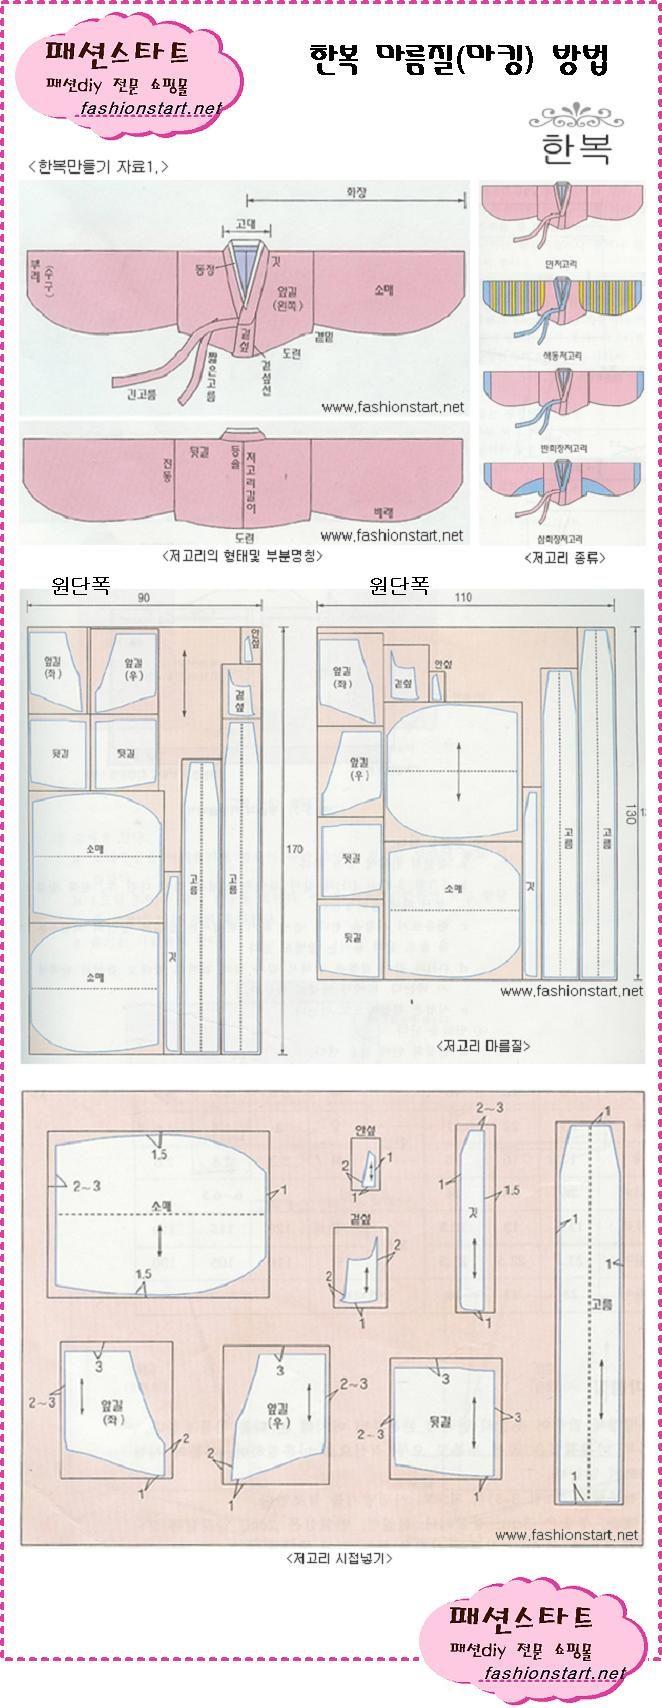 Daum 블로그 - 이미지 원본보기 | 한복 | Pinterest | Nähen